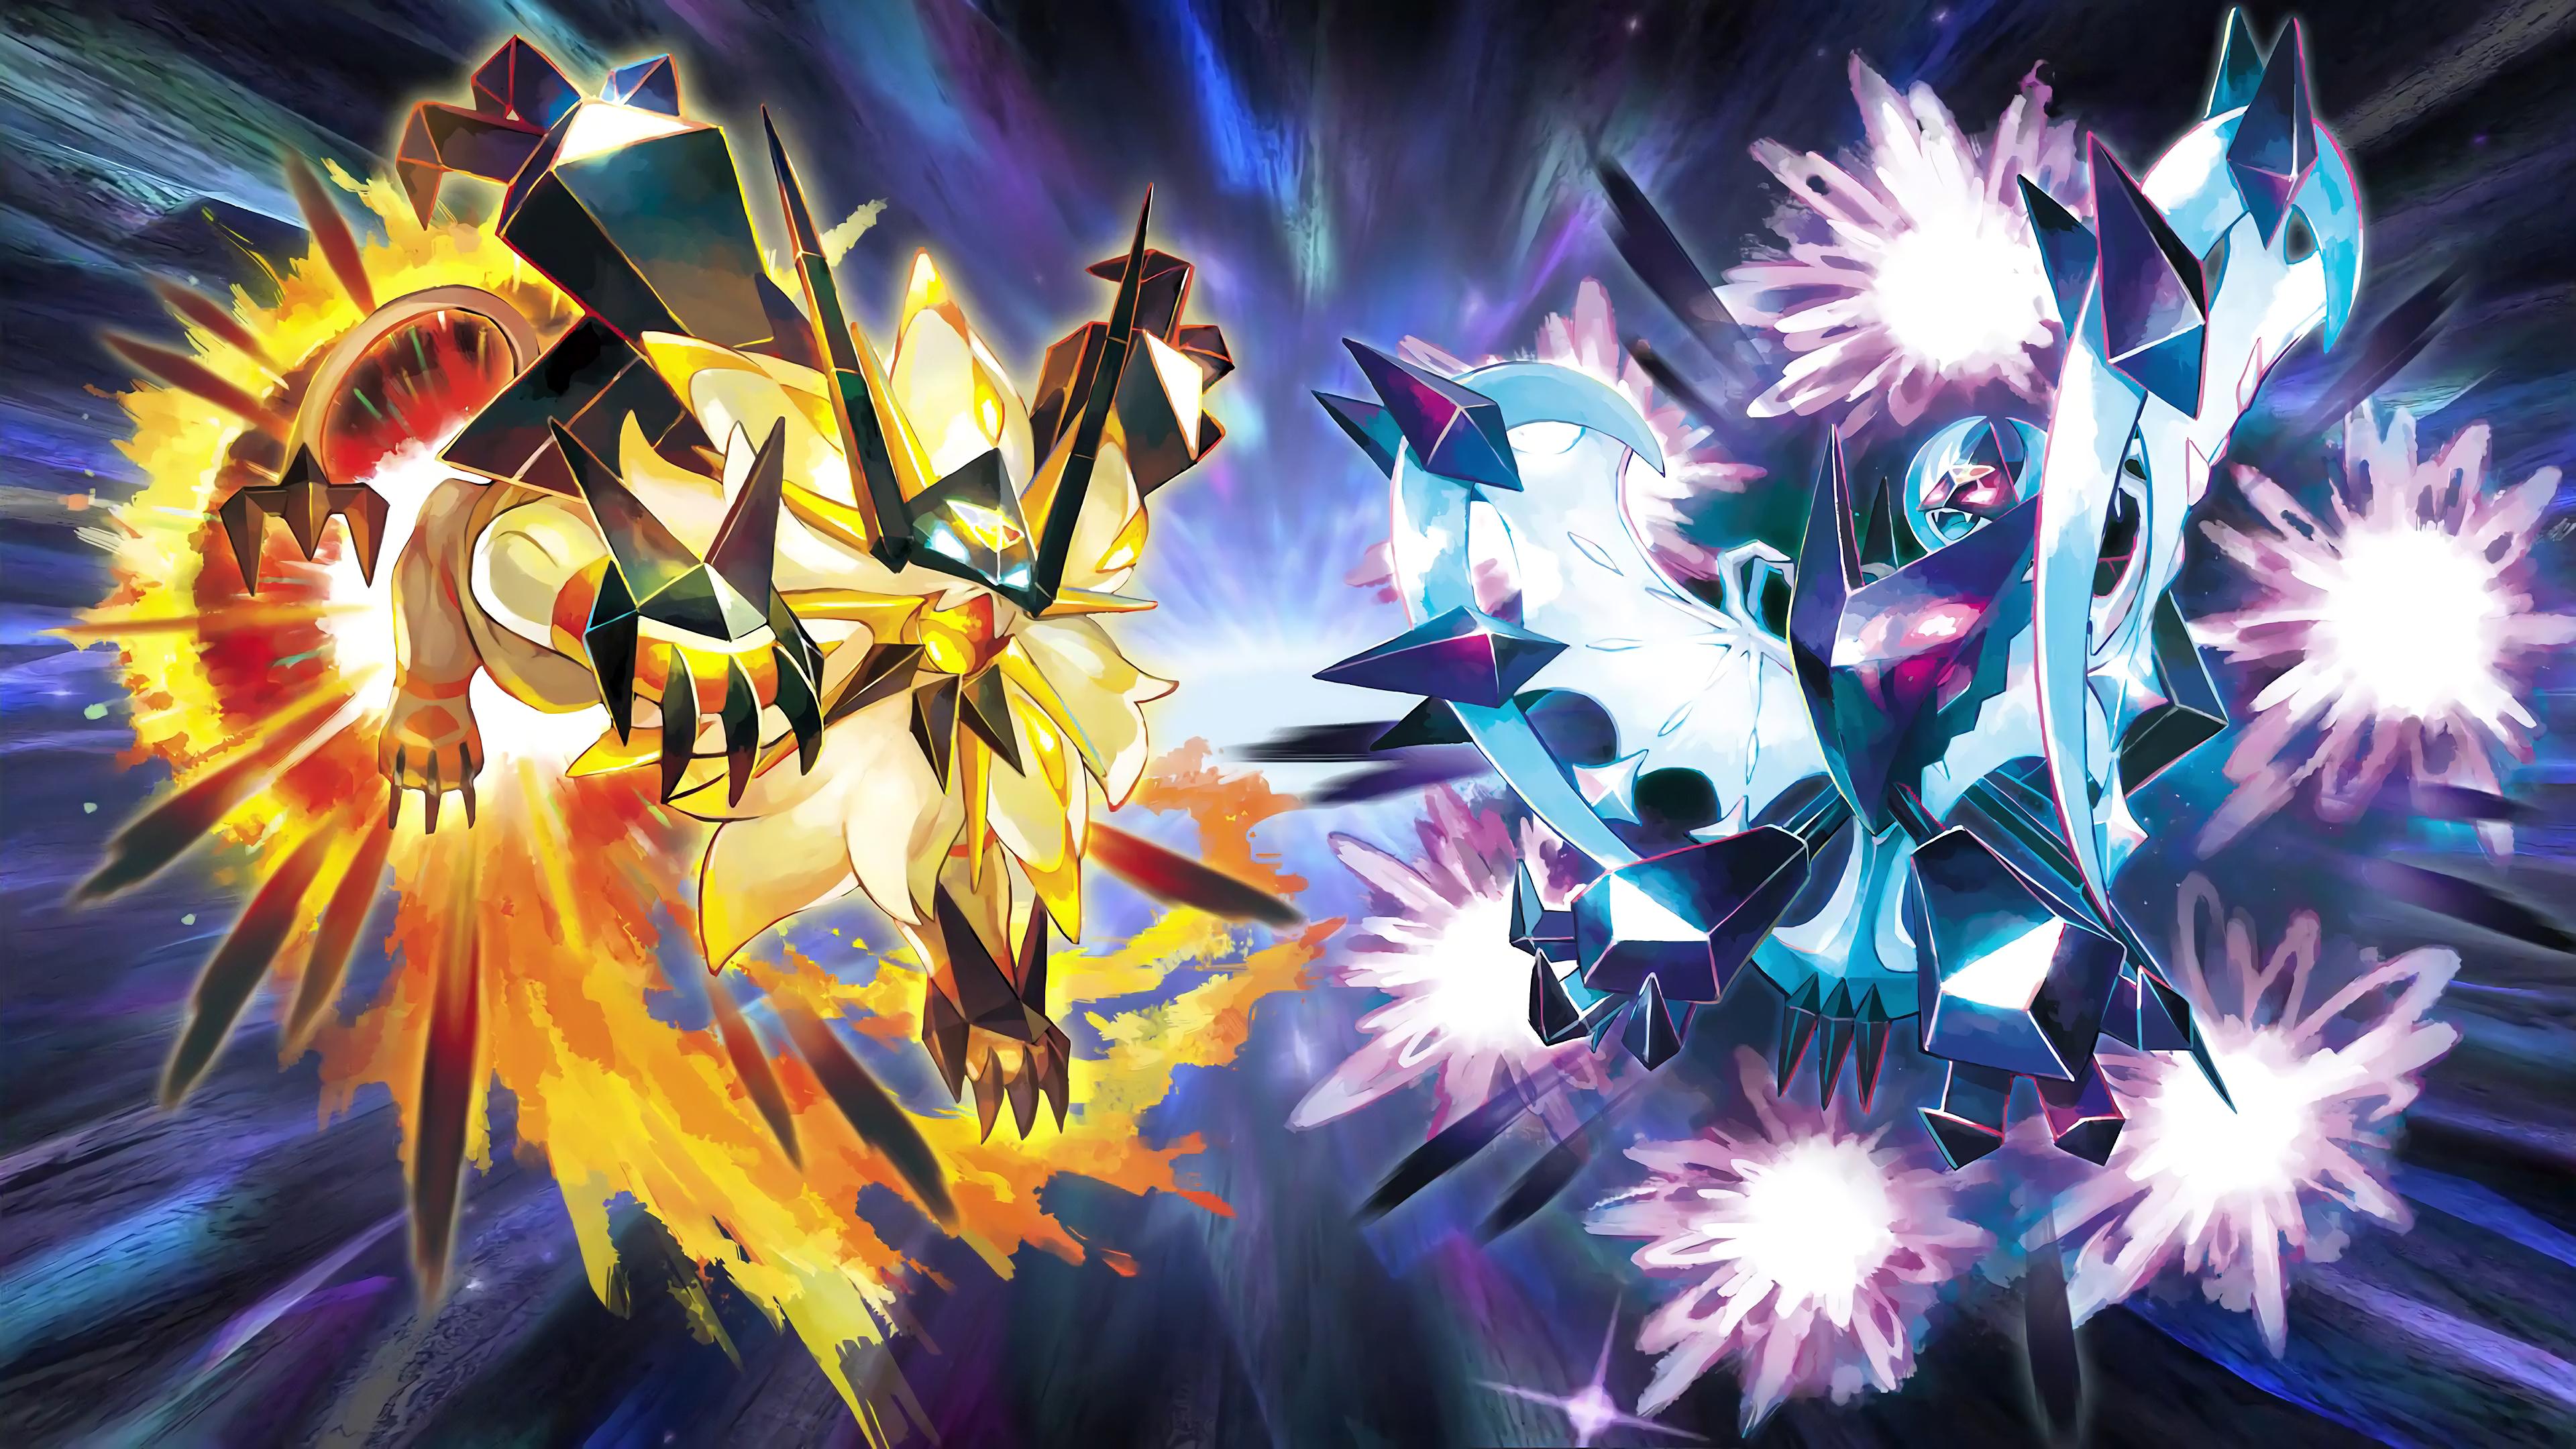 Pokemon Wallpaper on newwallpaperdownloadcom 3840x2160